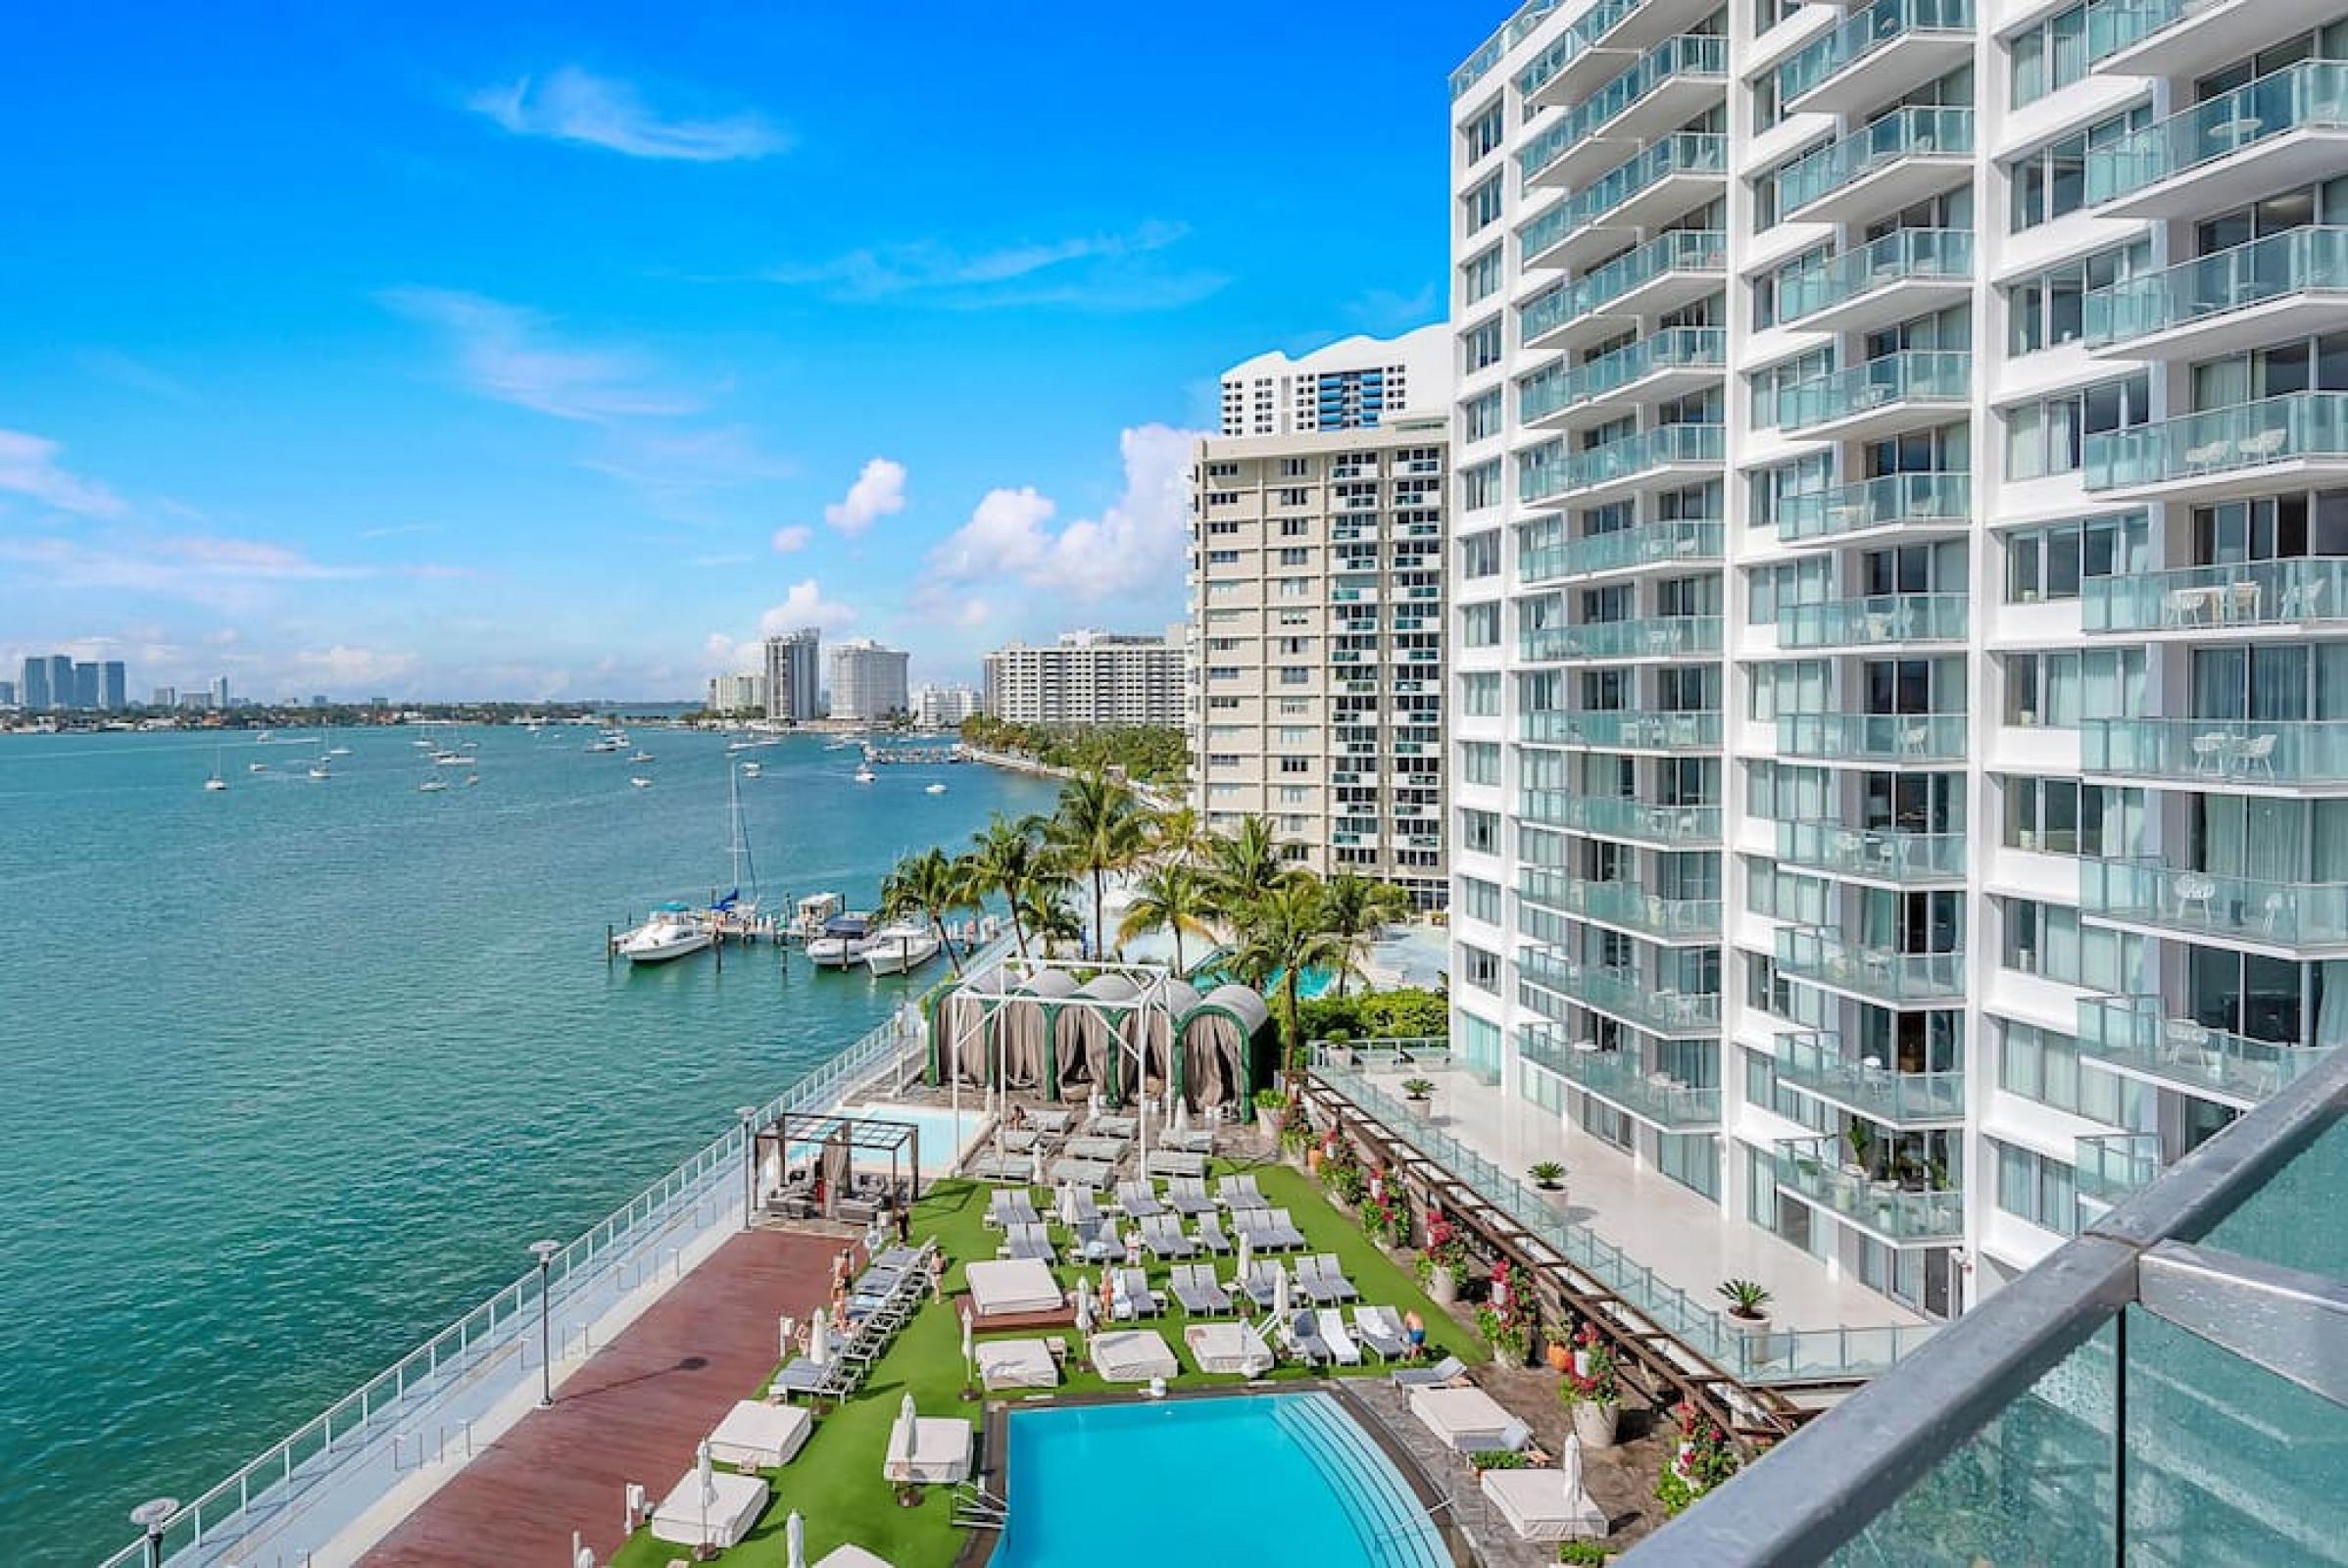 1100 West 726 Luxury Bay View 2 Bedroom 2 Bath Suite & Balcony